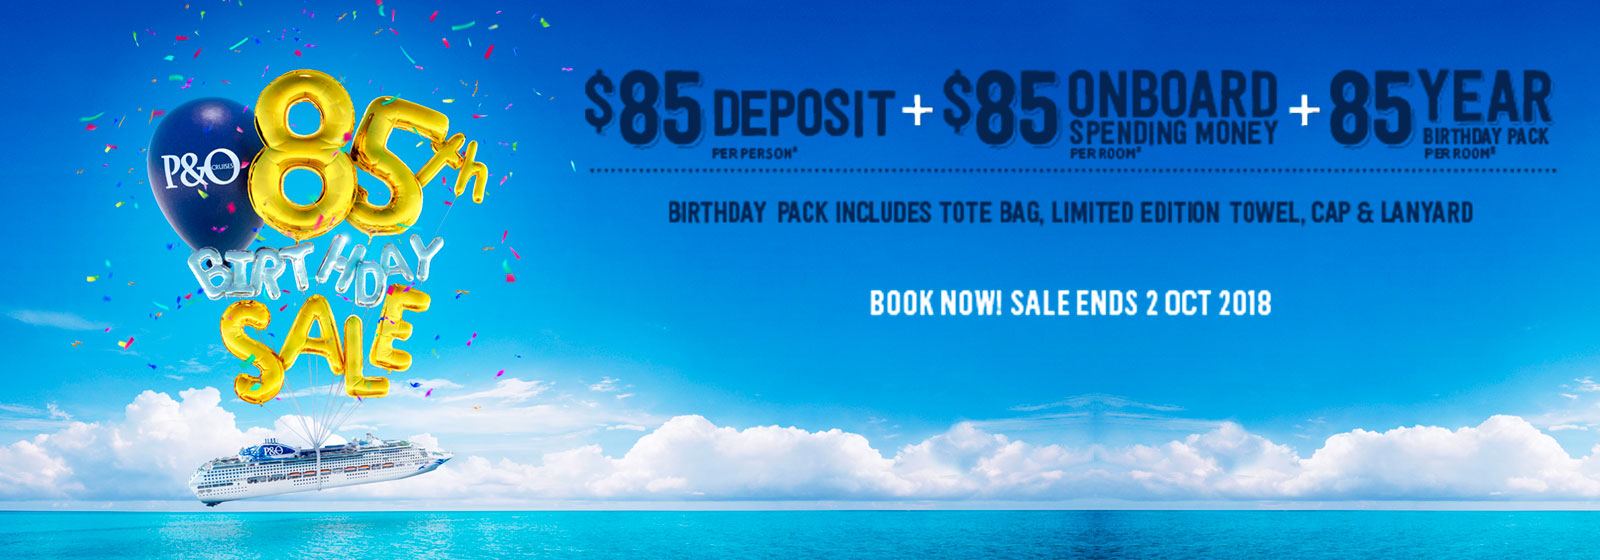 P&O's 85th Birthday Sale